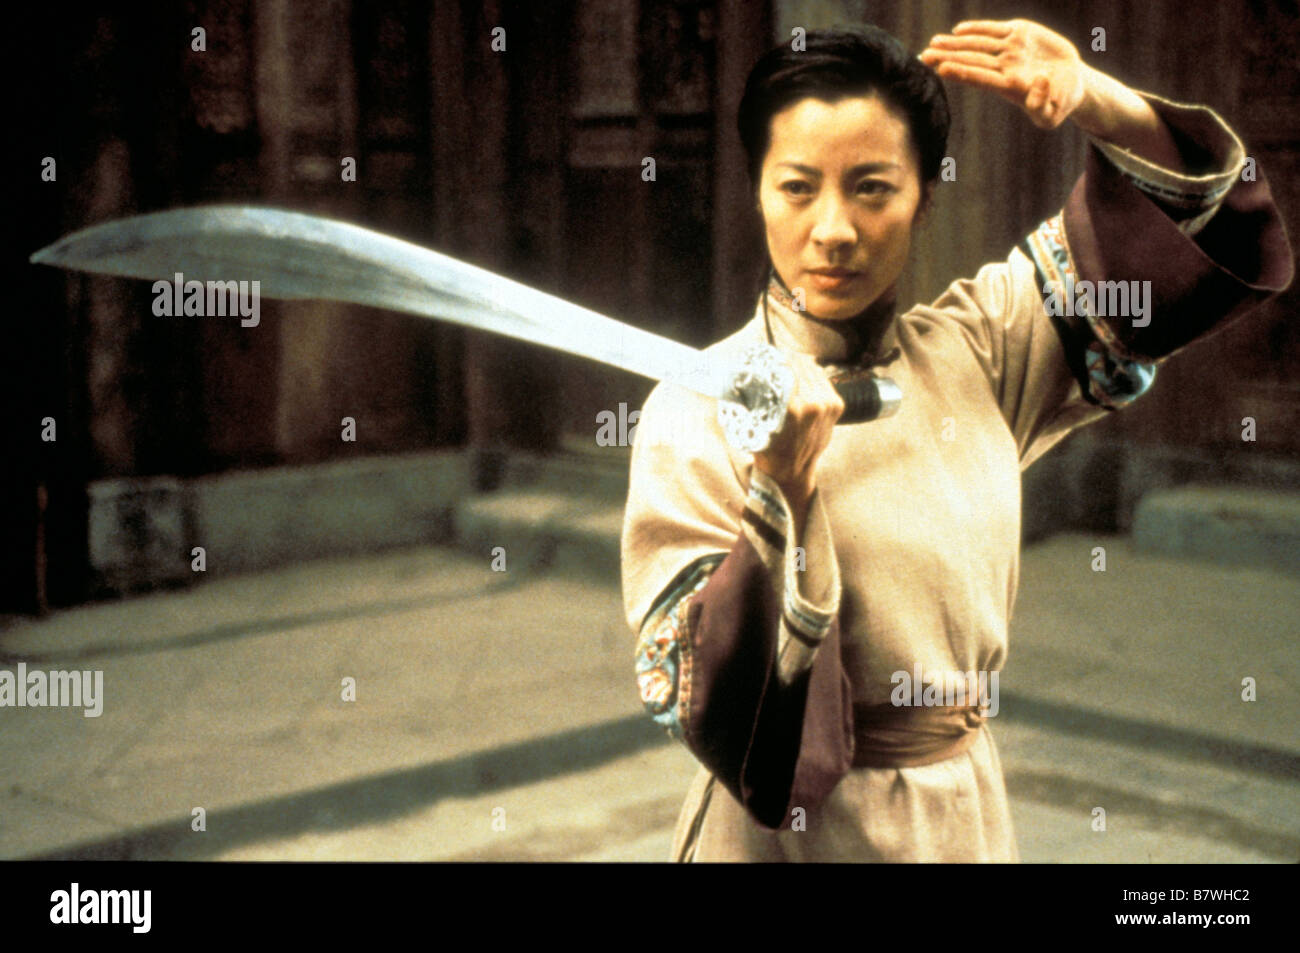 Wo hu cang long / Crouching Tiger, Hidden Dragon  Year: 2000 - china Michelle Yeoh  Director: Ang Lee - Stock Image